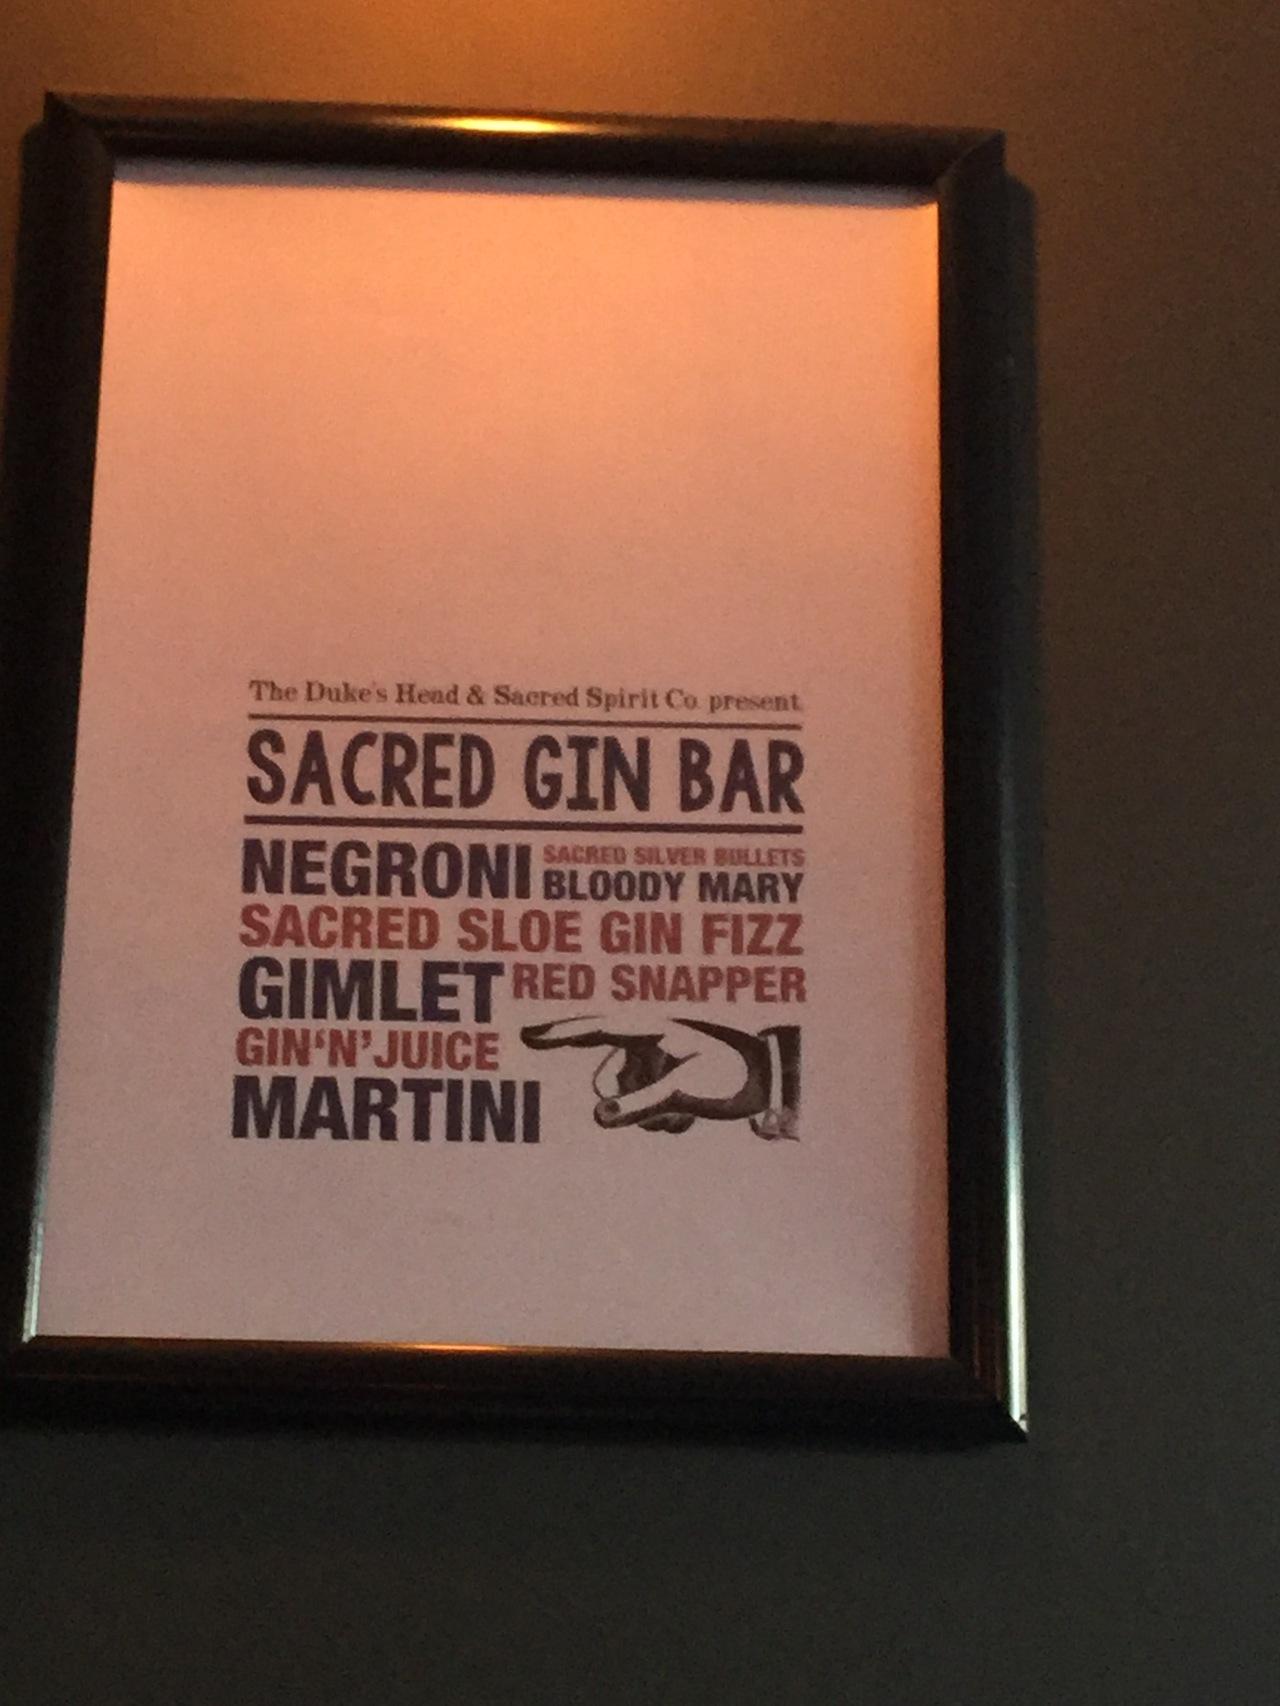 The Sacred Gin Bar at The Duke's Head